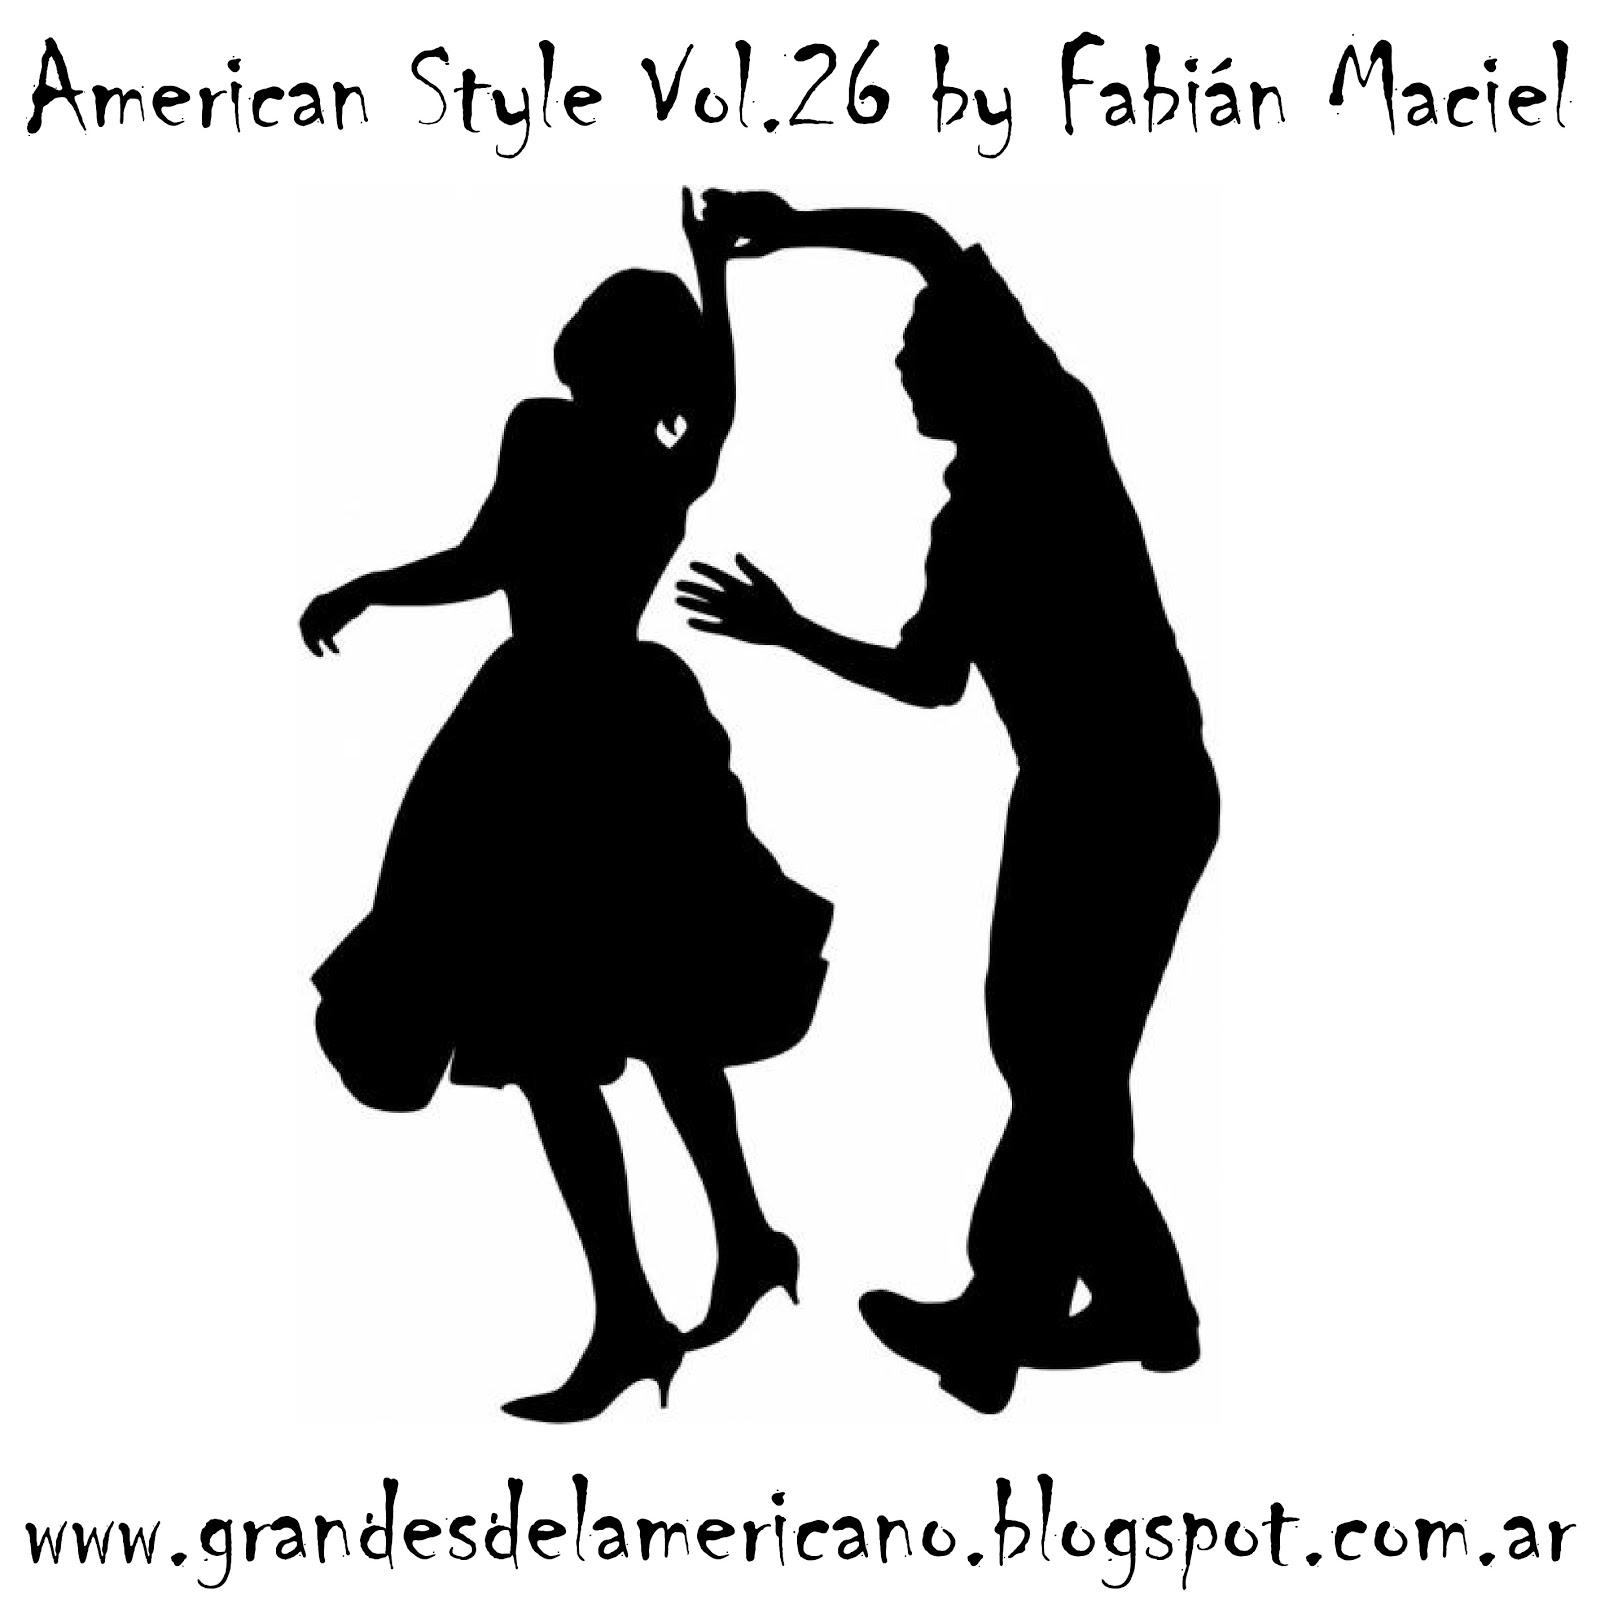 http://2.bp.blogspot.com/-5__VzcLgUF4/UIAOJbkRAcI/AAAAAAAADUc/IlK746bii-o/s1600/AST0026byFM.jpg